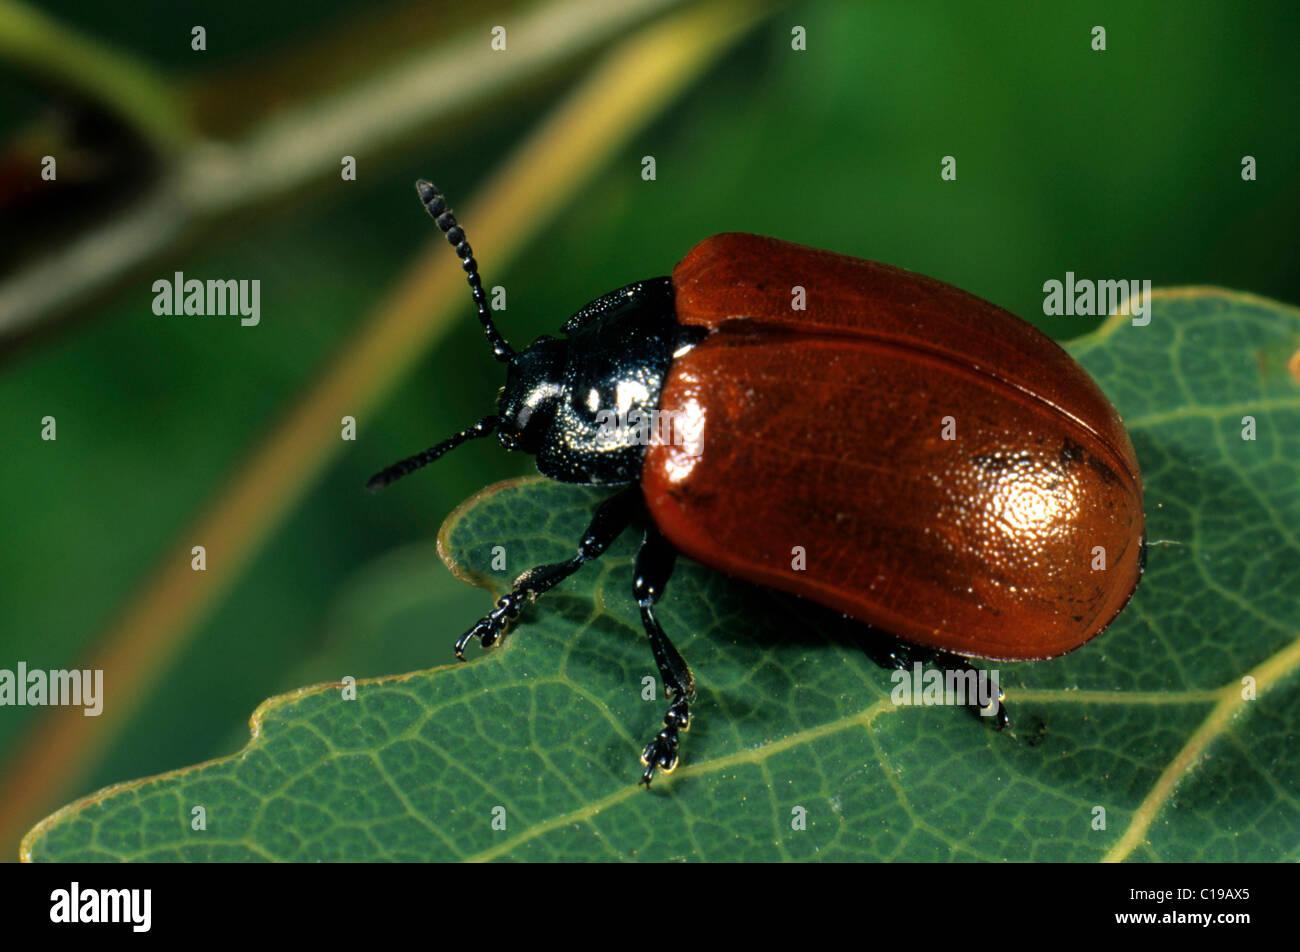 Poplar Leaf Beetle (Chrysomela populi) - Stock Image